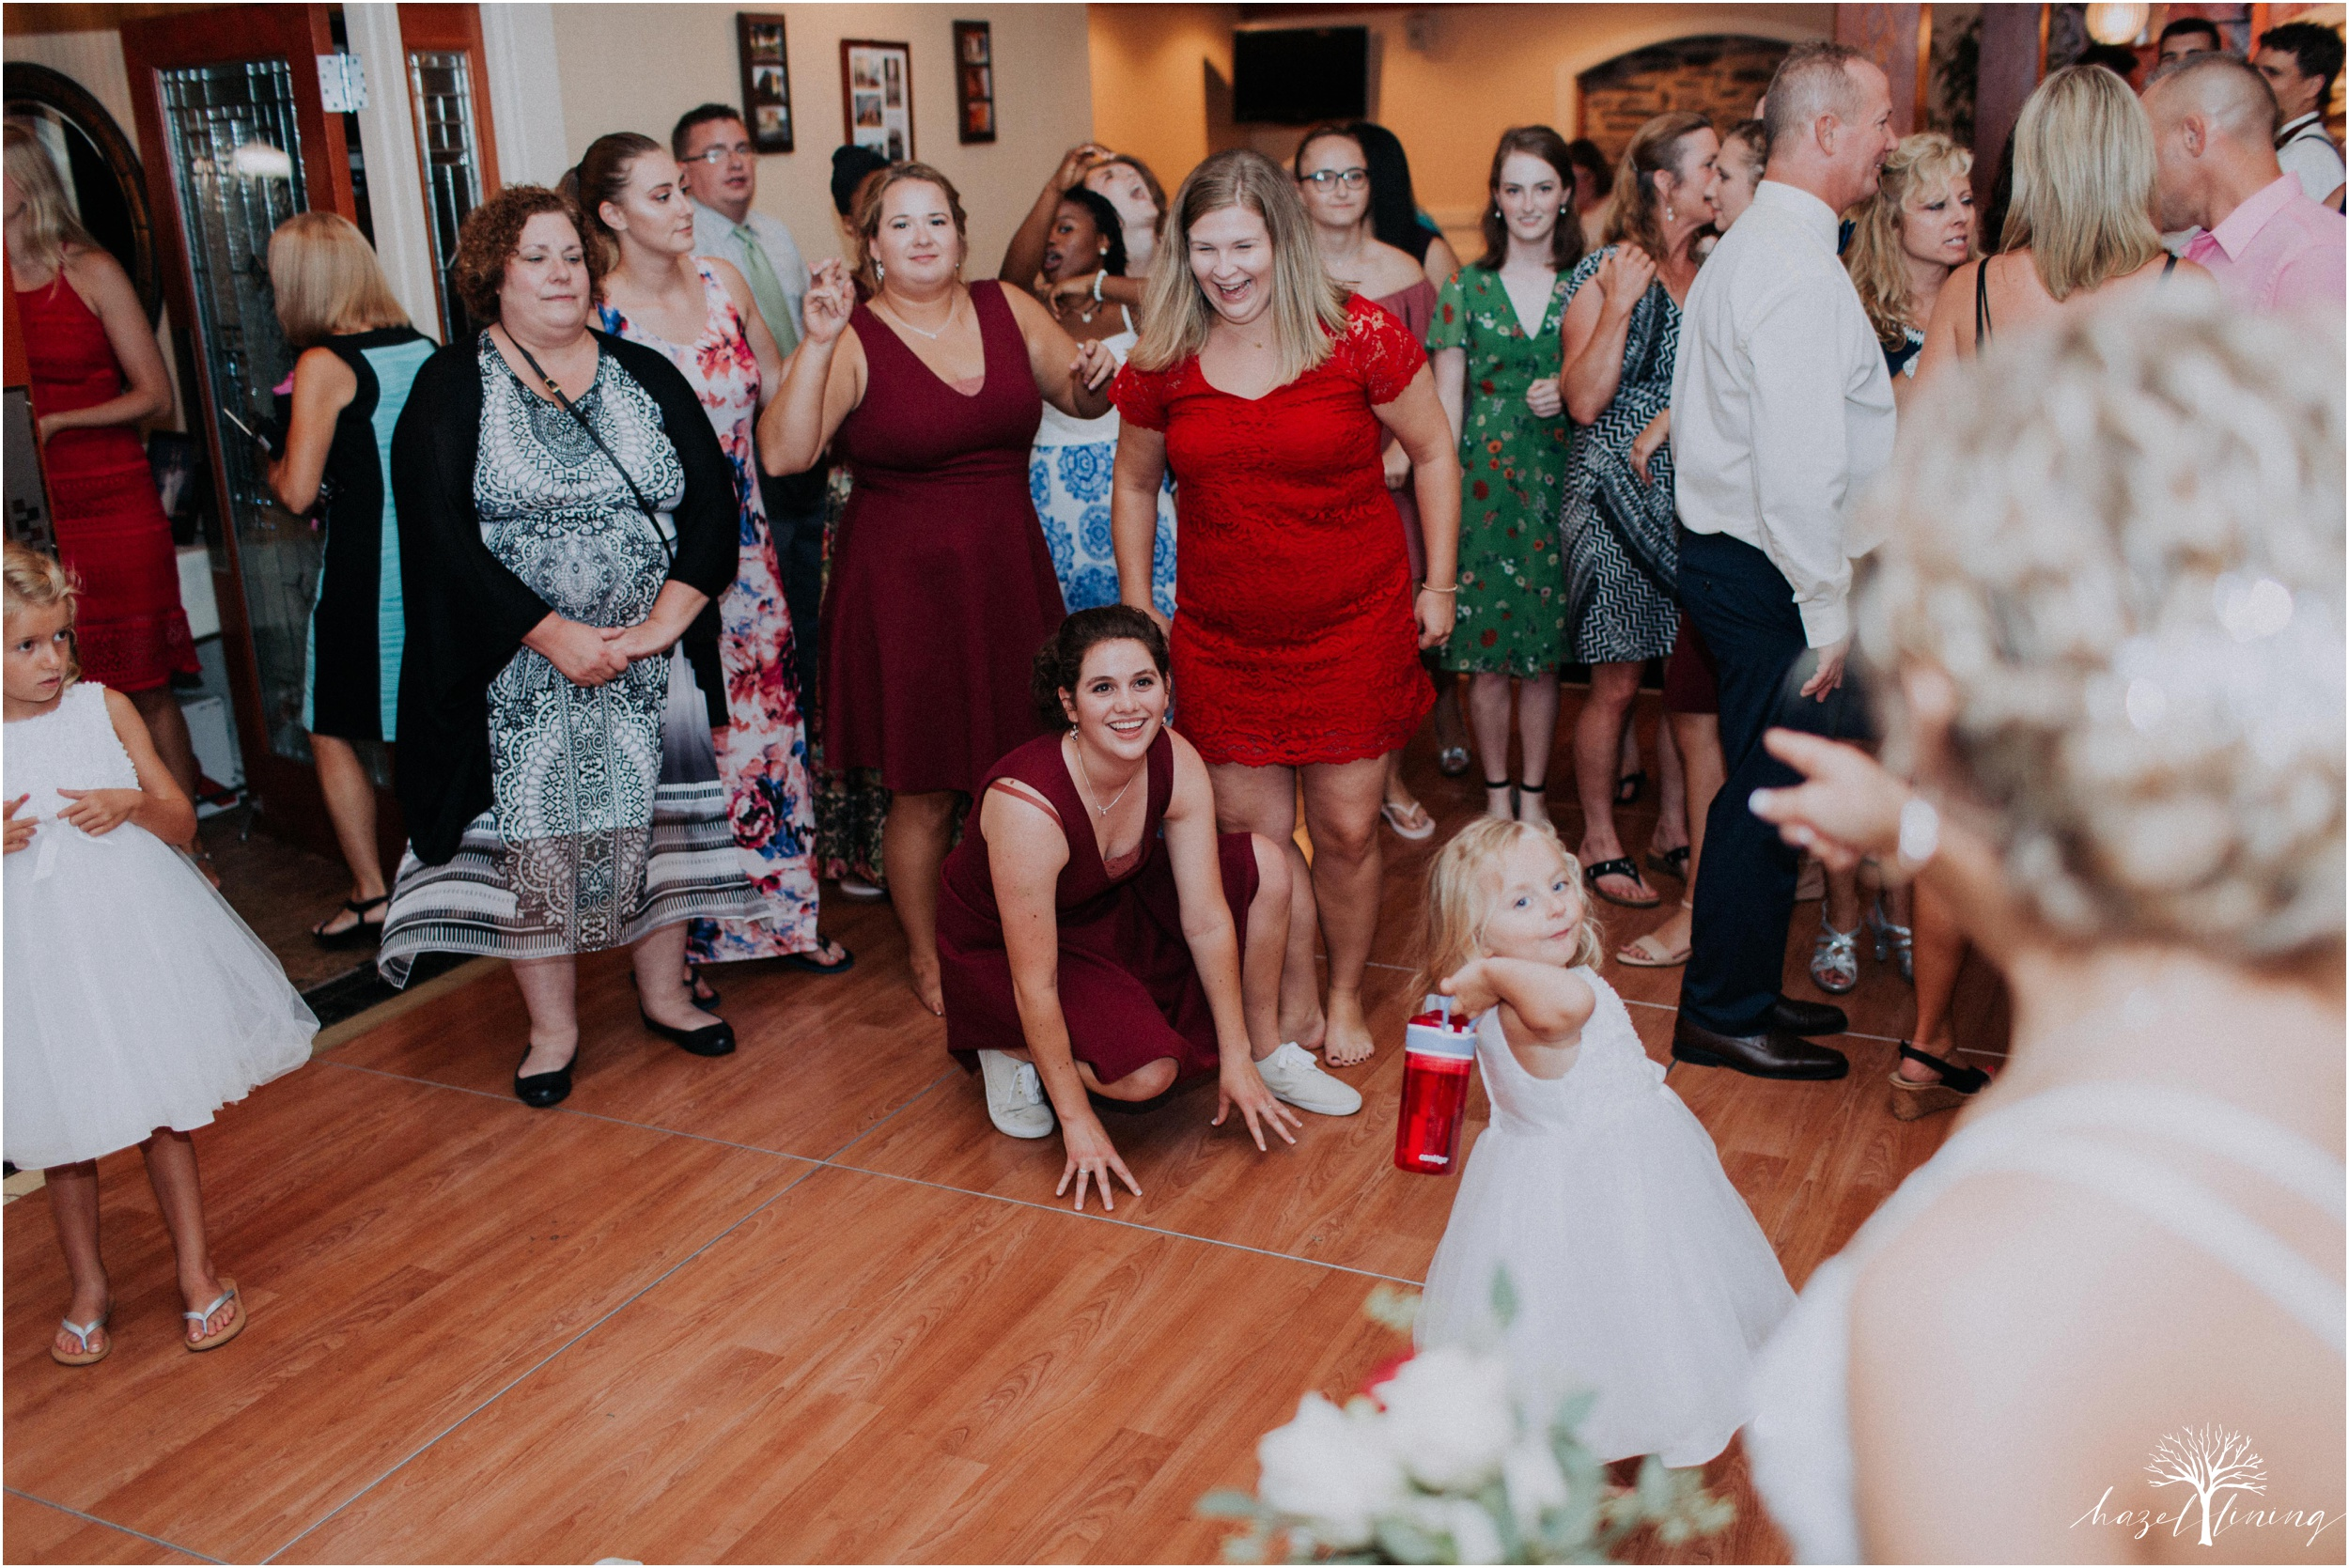 jonathan-weibel-becky-haywood-loft-at-sweetwater-cc-pennsburg-pennsylvania-rainy-day-summer-wedding-hazel-lining-travel-wedding-elopement-photography_0148.jpg